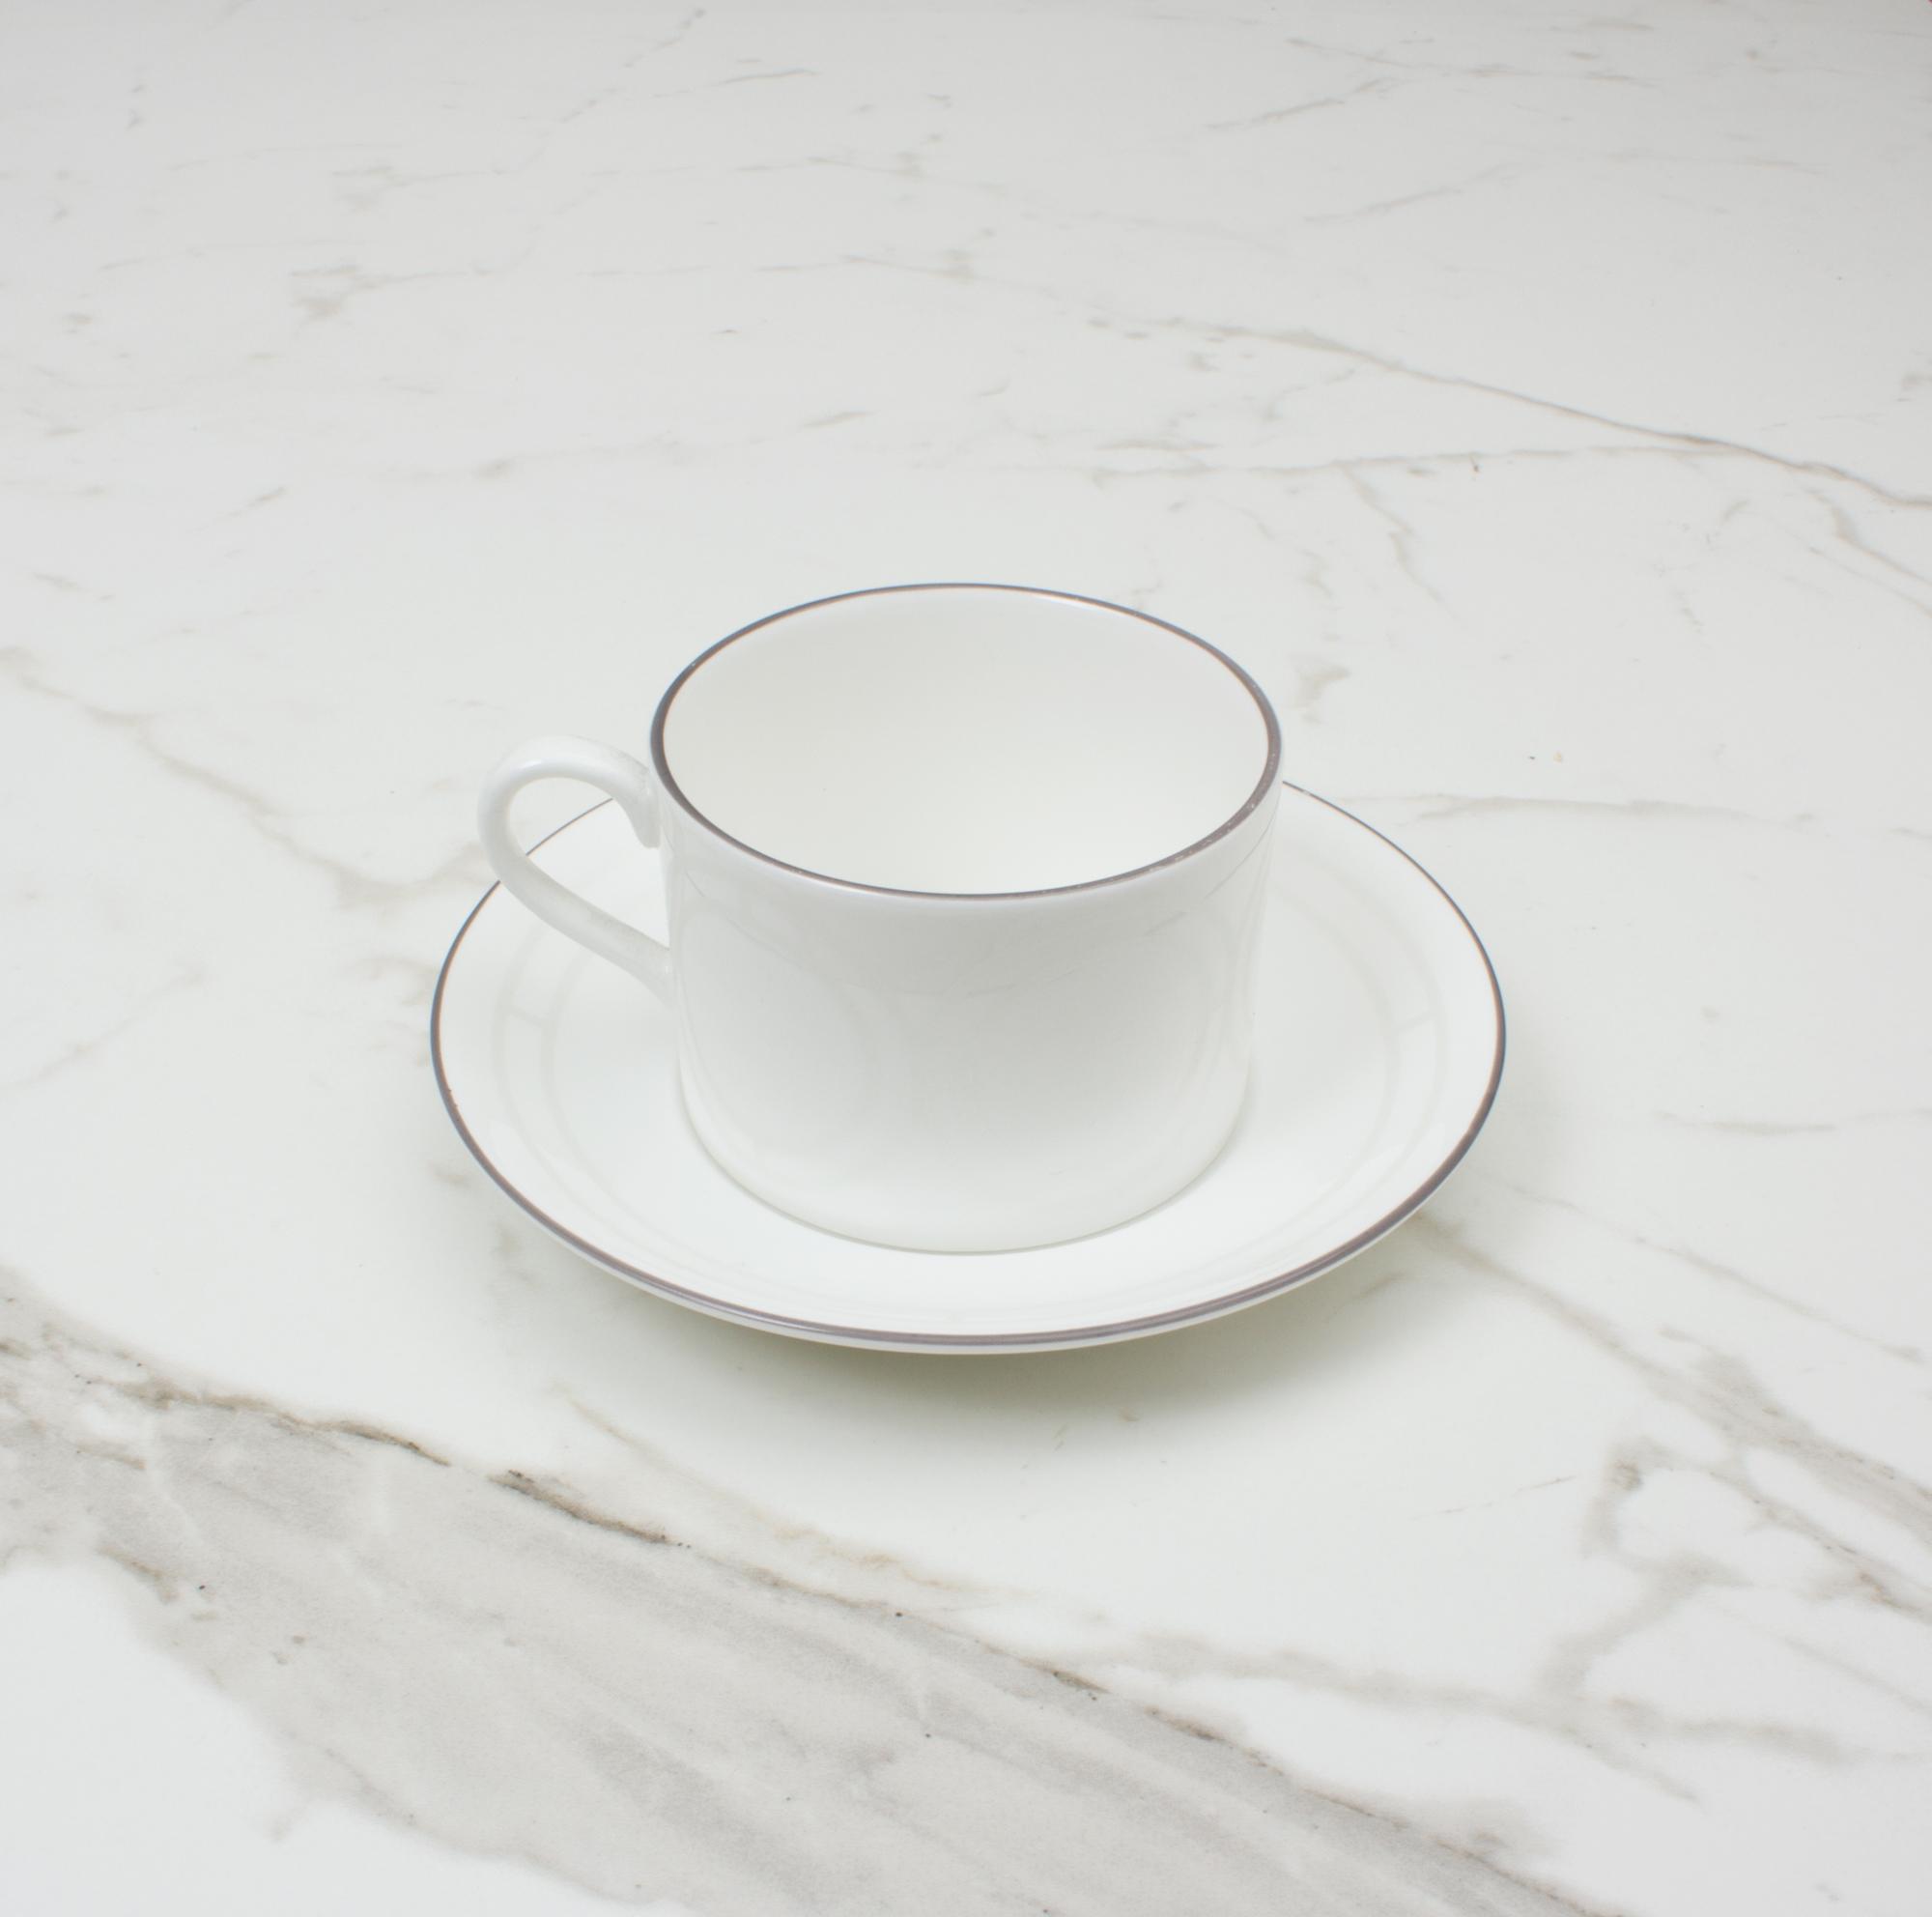 Palladian Tea Cup Saucer Design No 1 Brooklyn White Custhom Shop